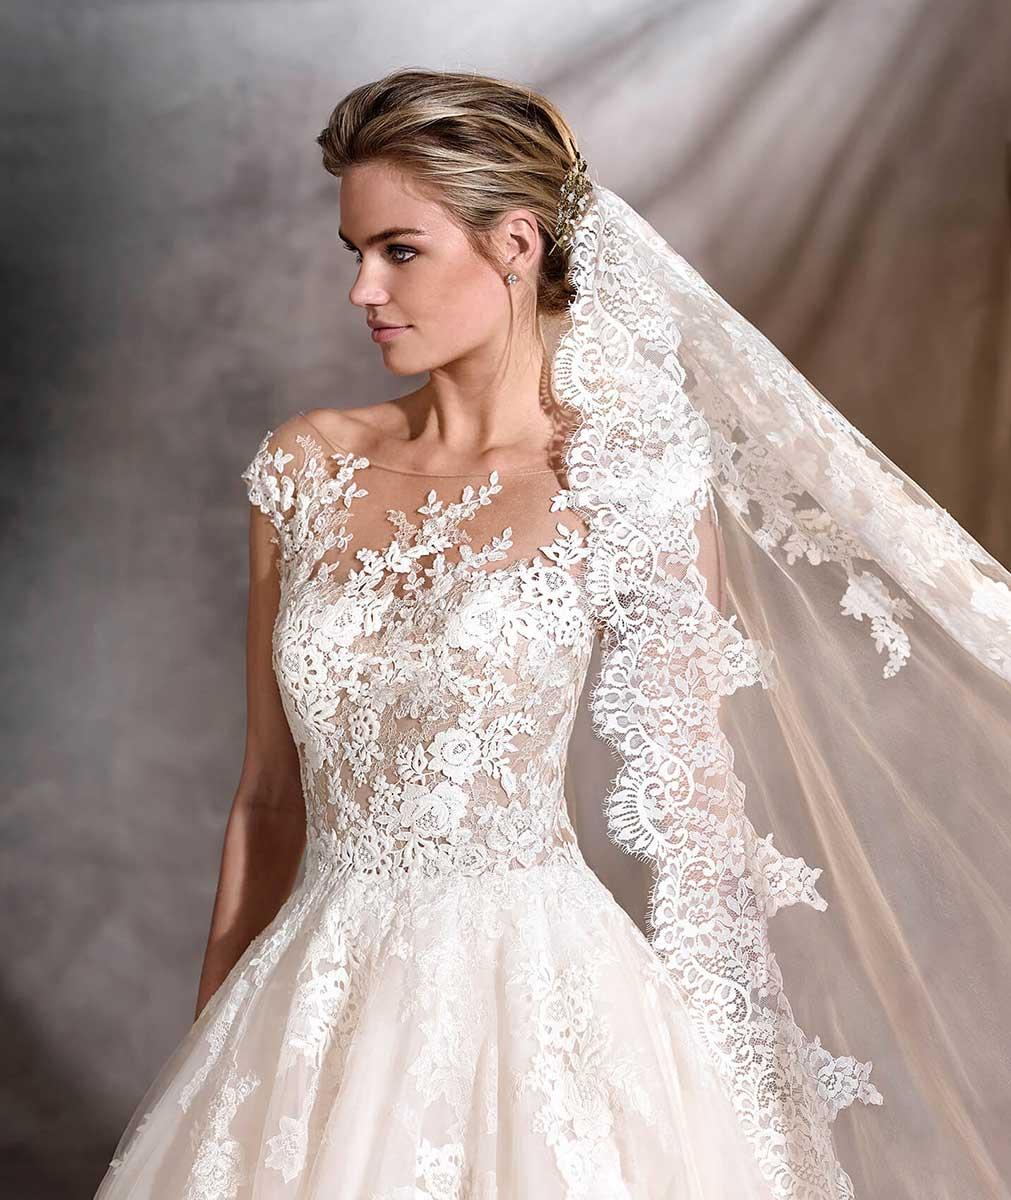 0a99acdd790 Pronovias Ofelia Size 14 Princess Wedding Dress - Mia Sposa Bridal ...